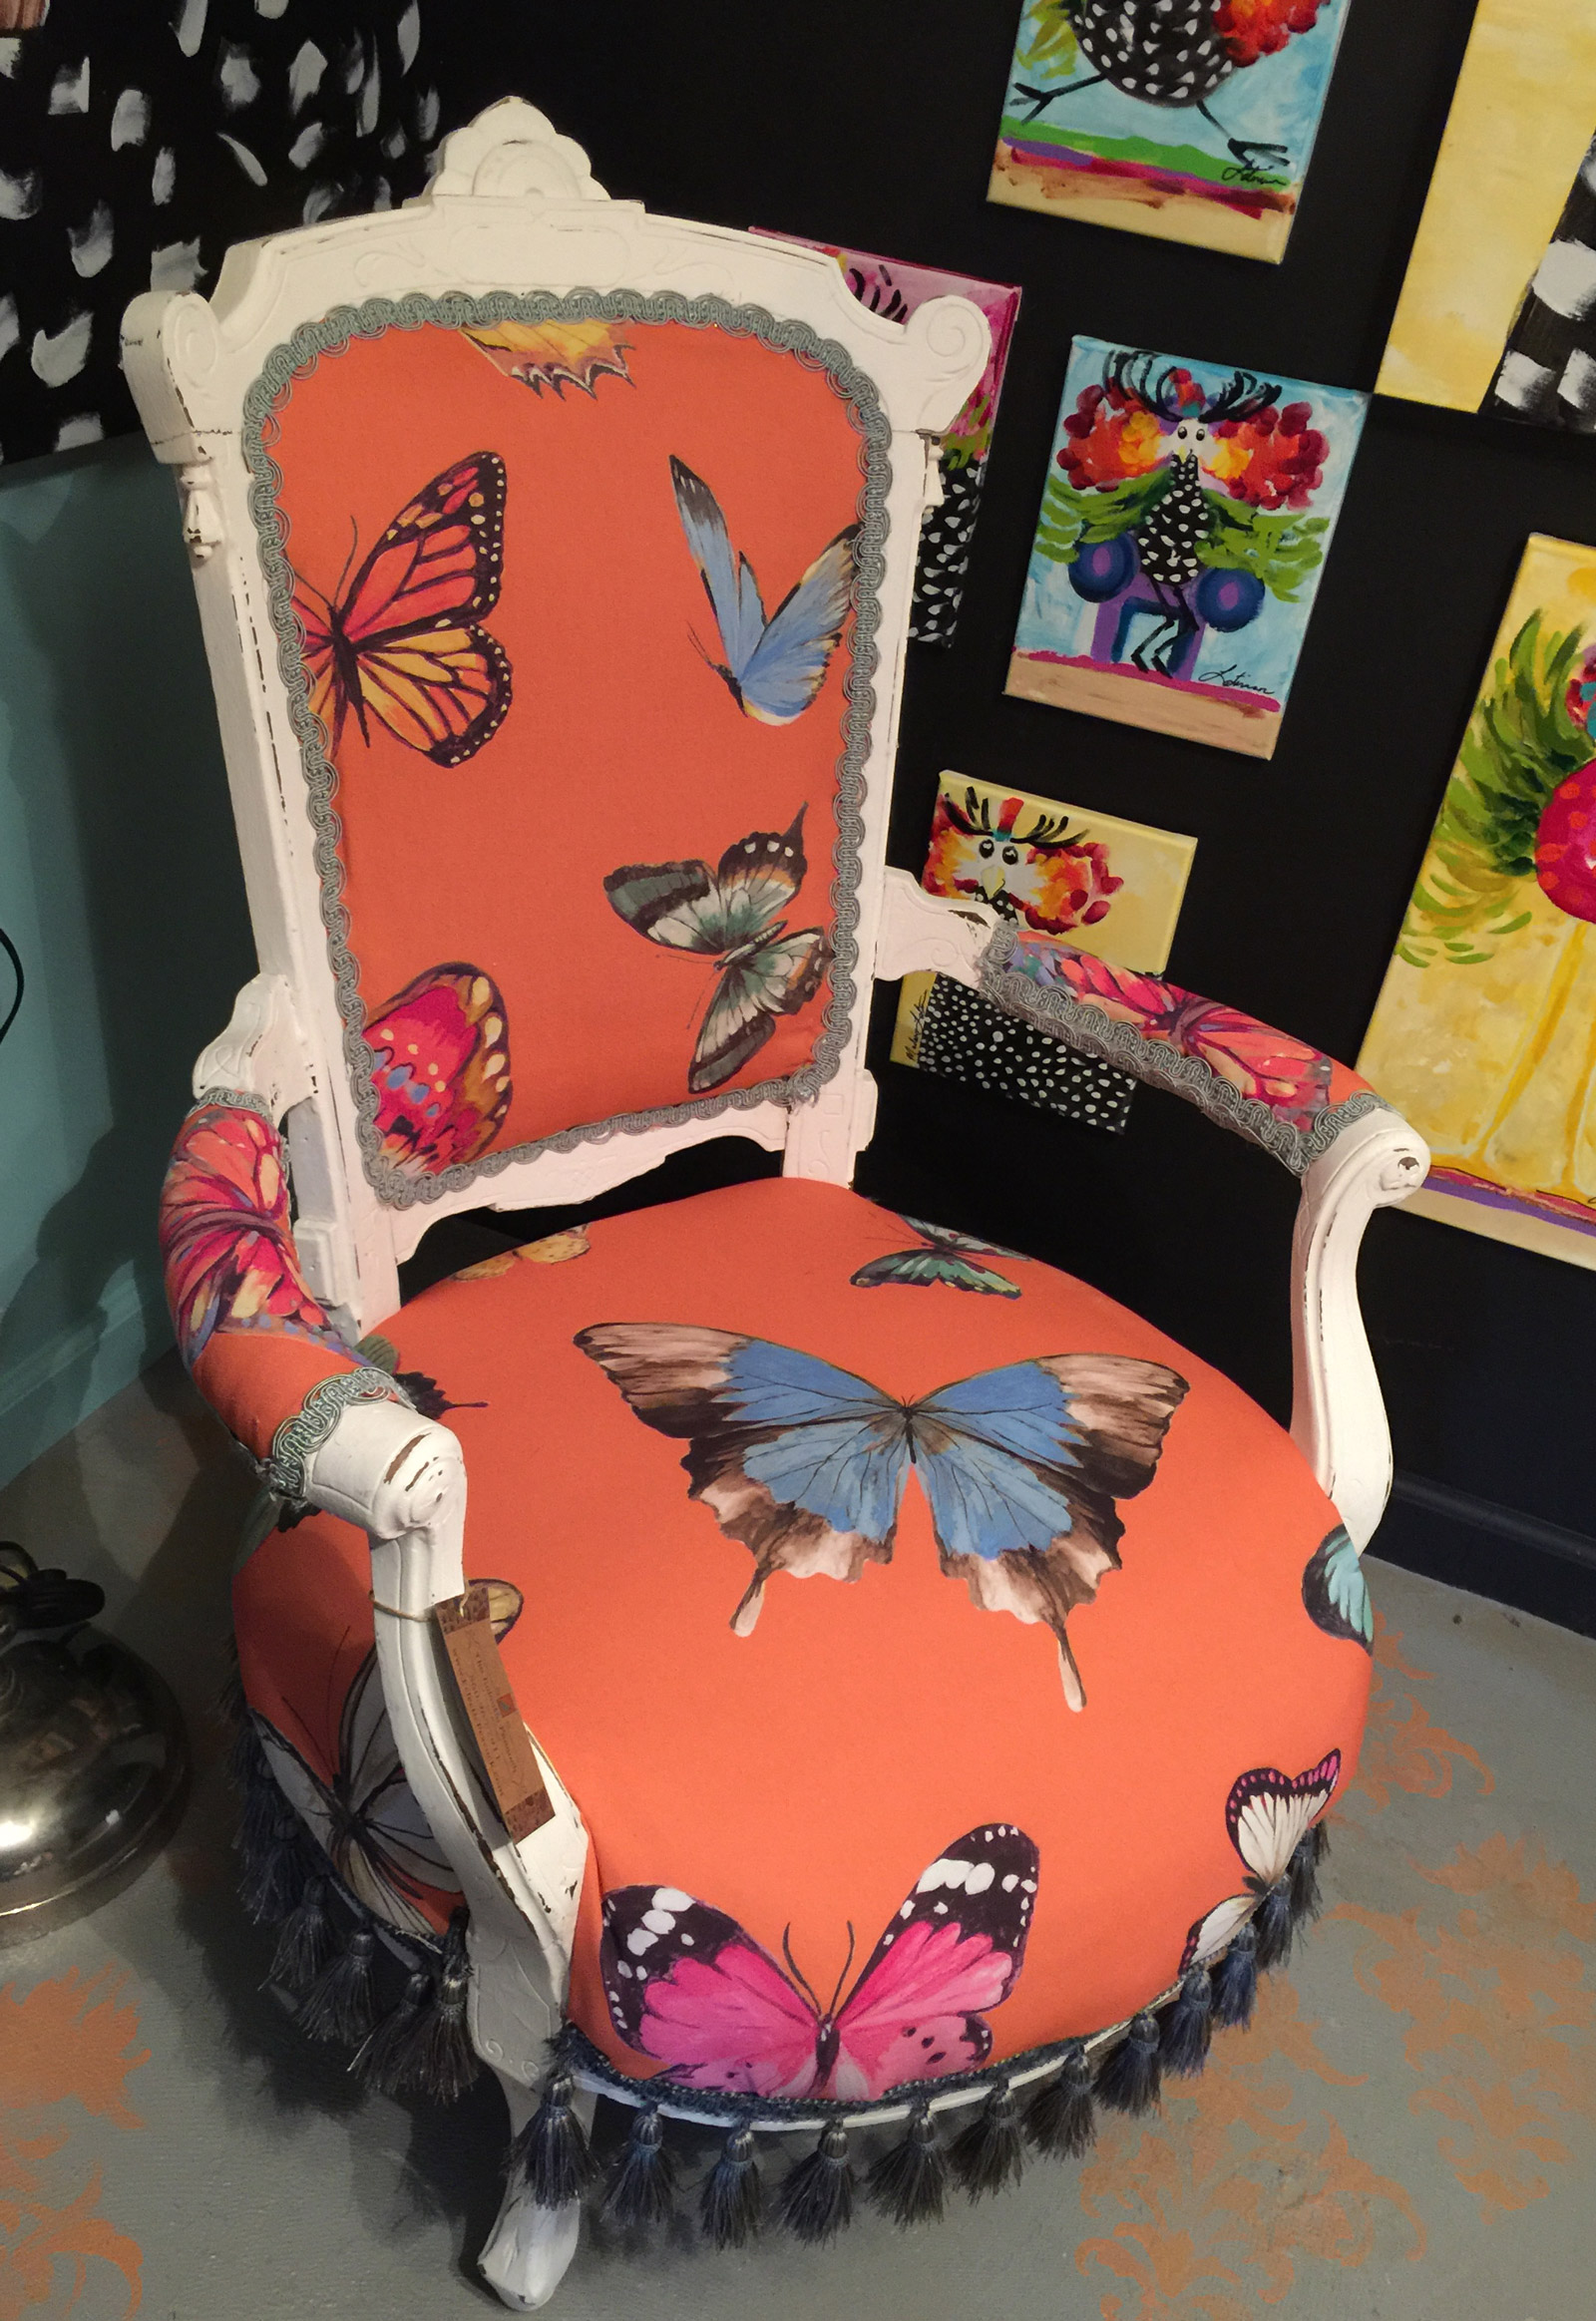 Custom-upholstered repurposed chair